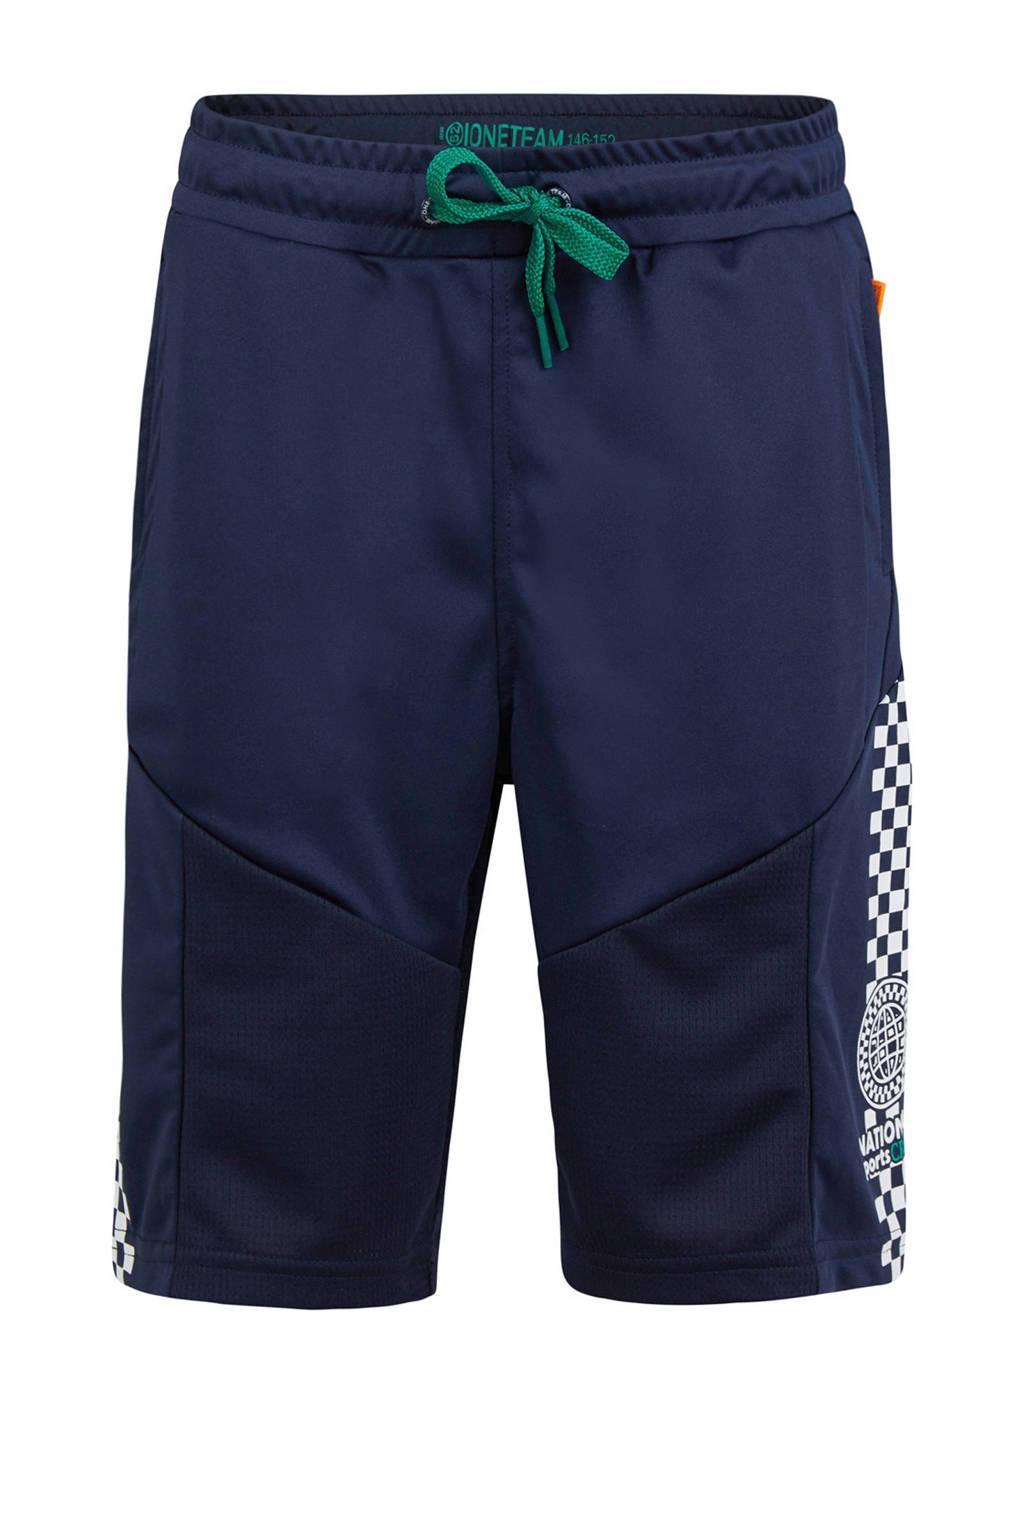 WE Fashion short met zijstreep donkerblauw, Donkerblauw